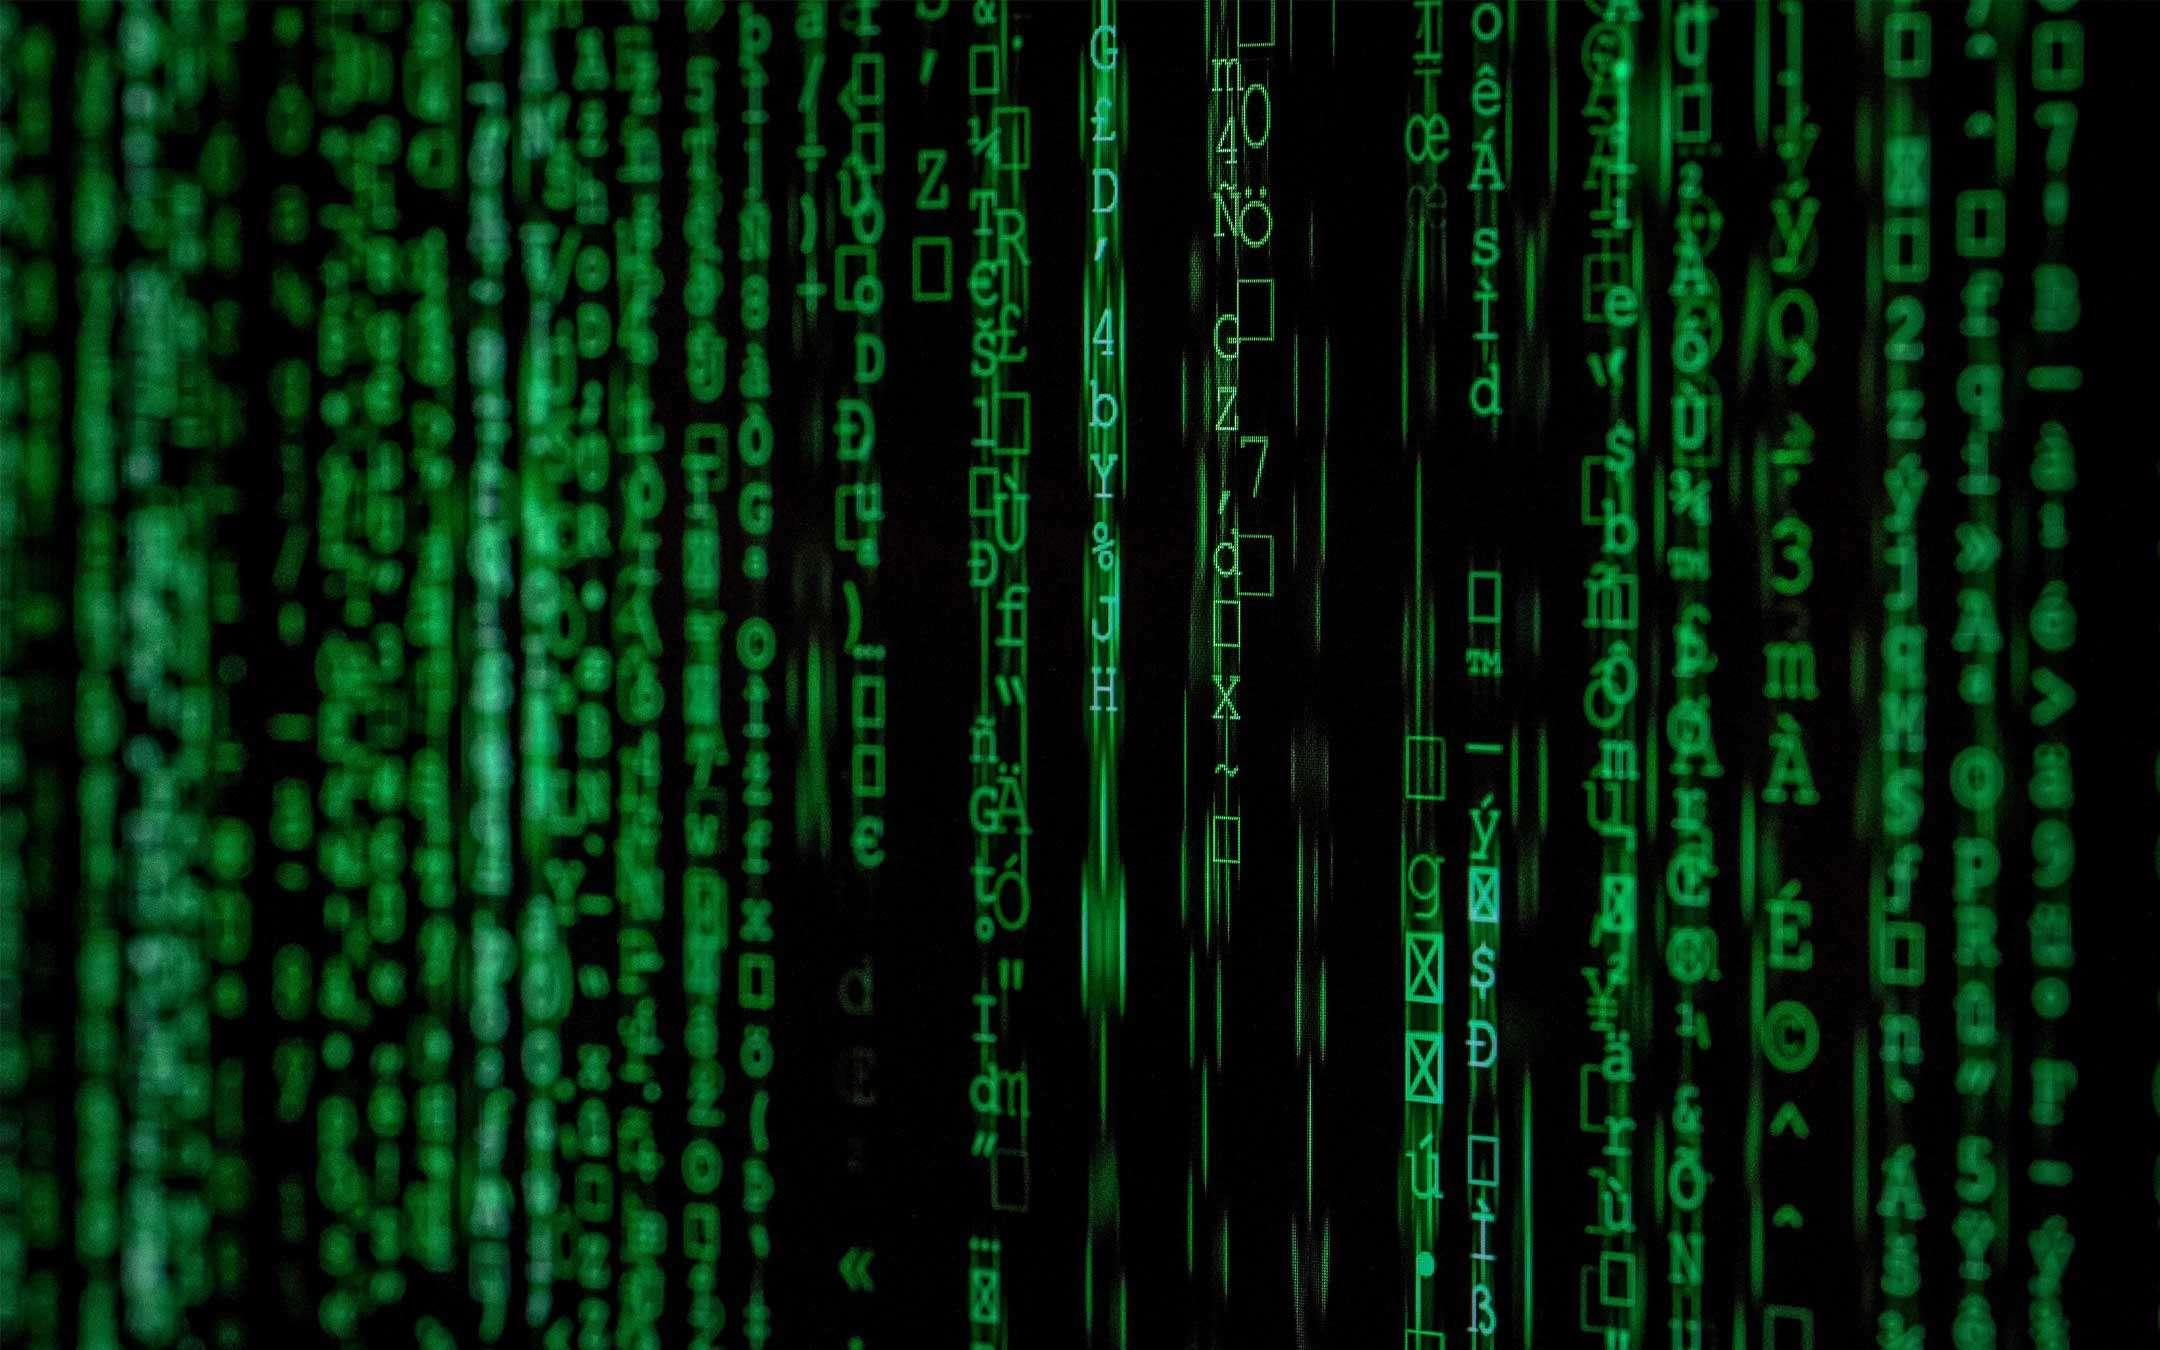 Will Matrix Resurrections be the title of Matrix 4?